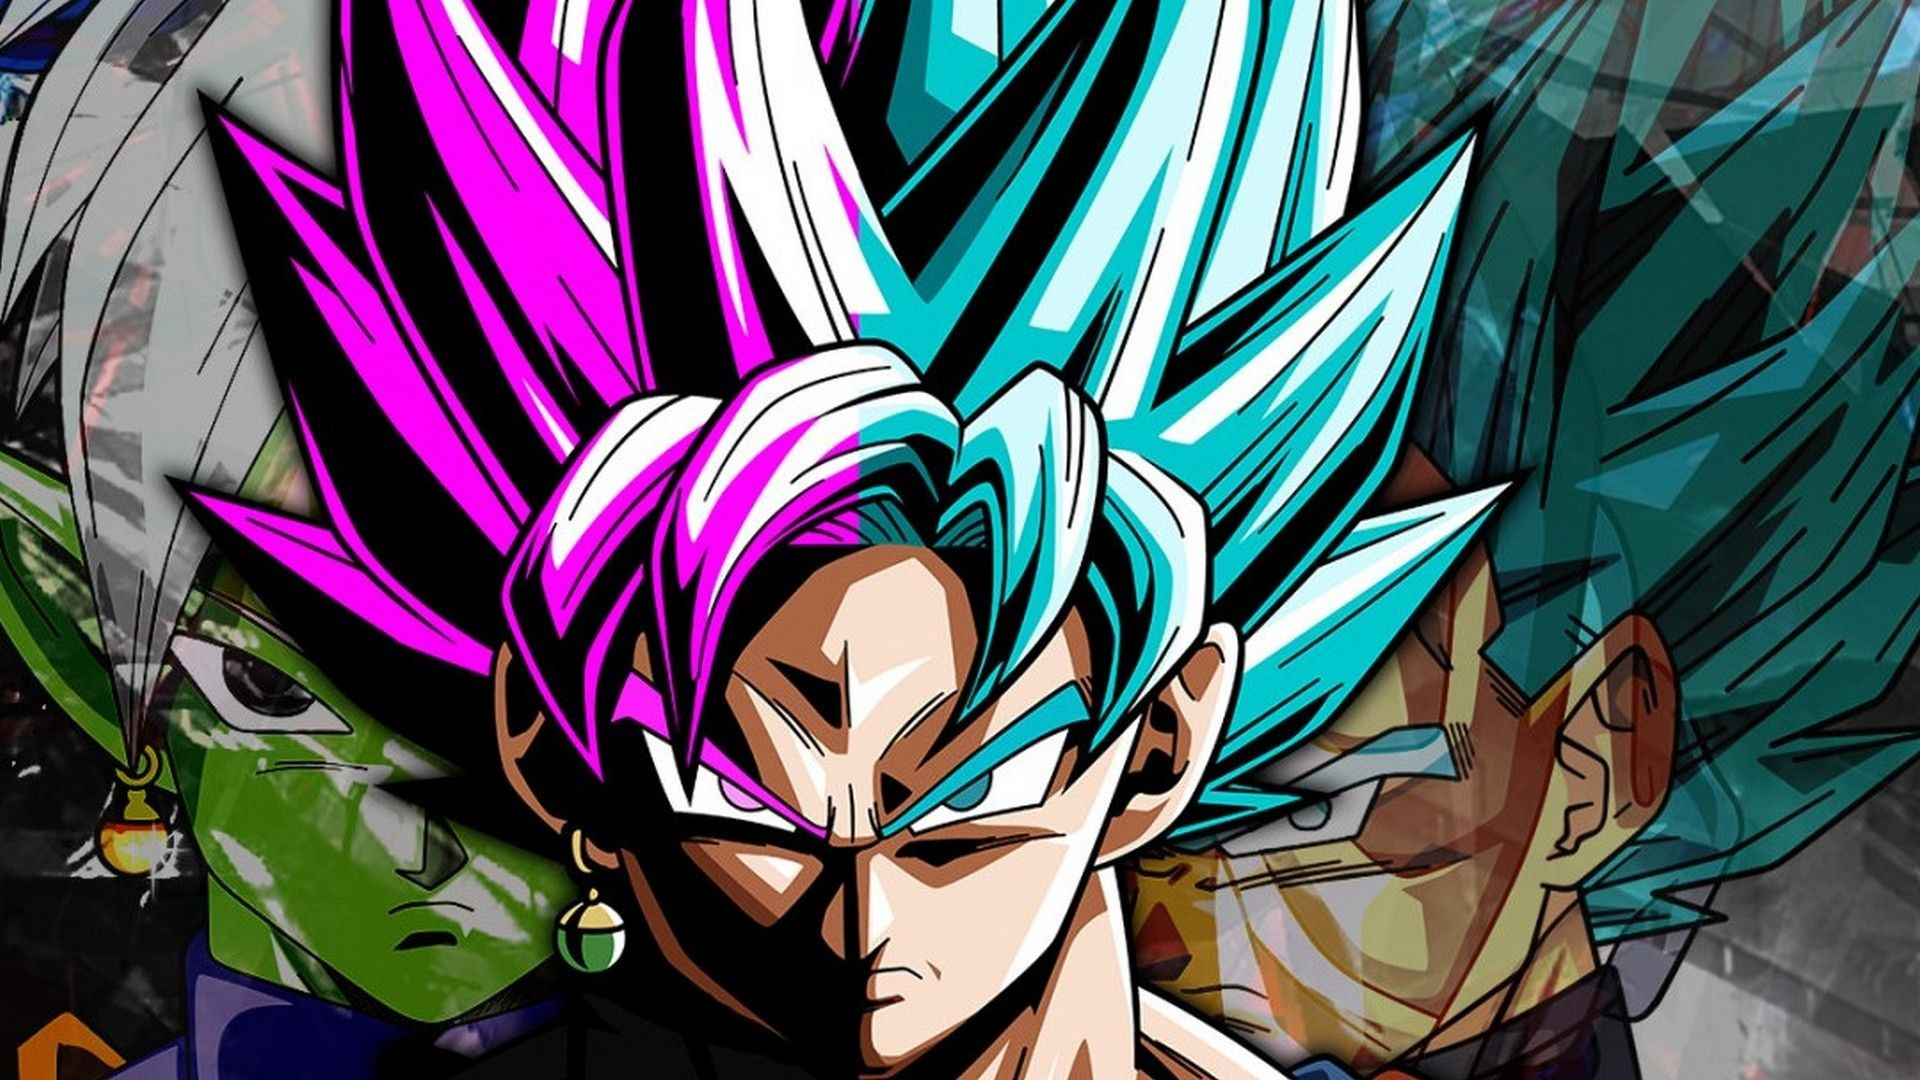 Goku Black Wallpaper 4K - Badass Black Goku Wallpapers Top ...